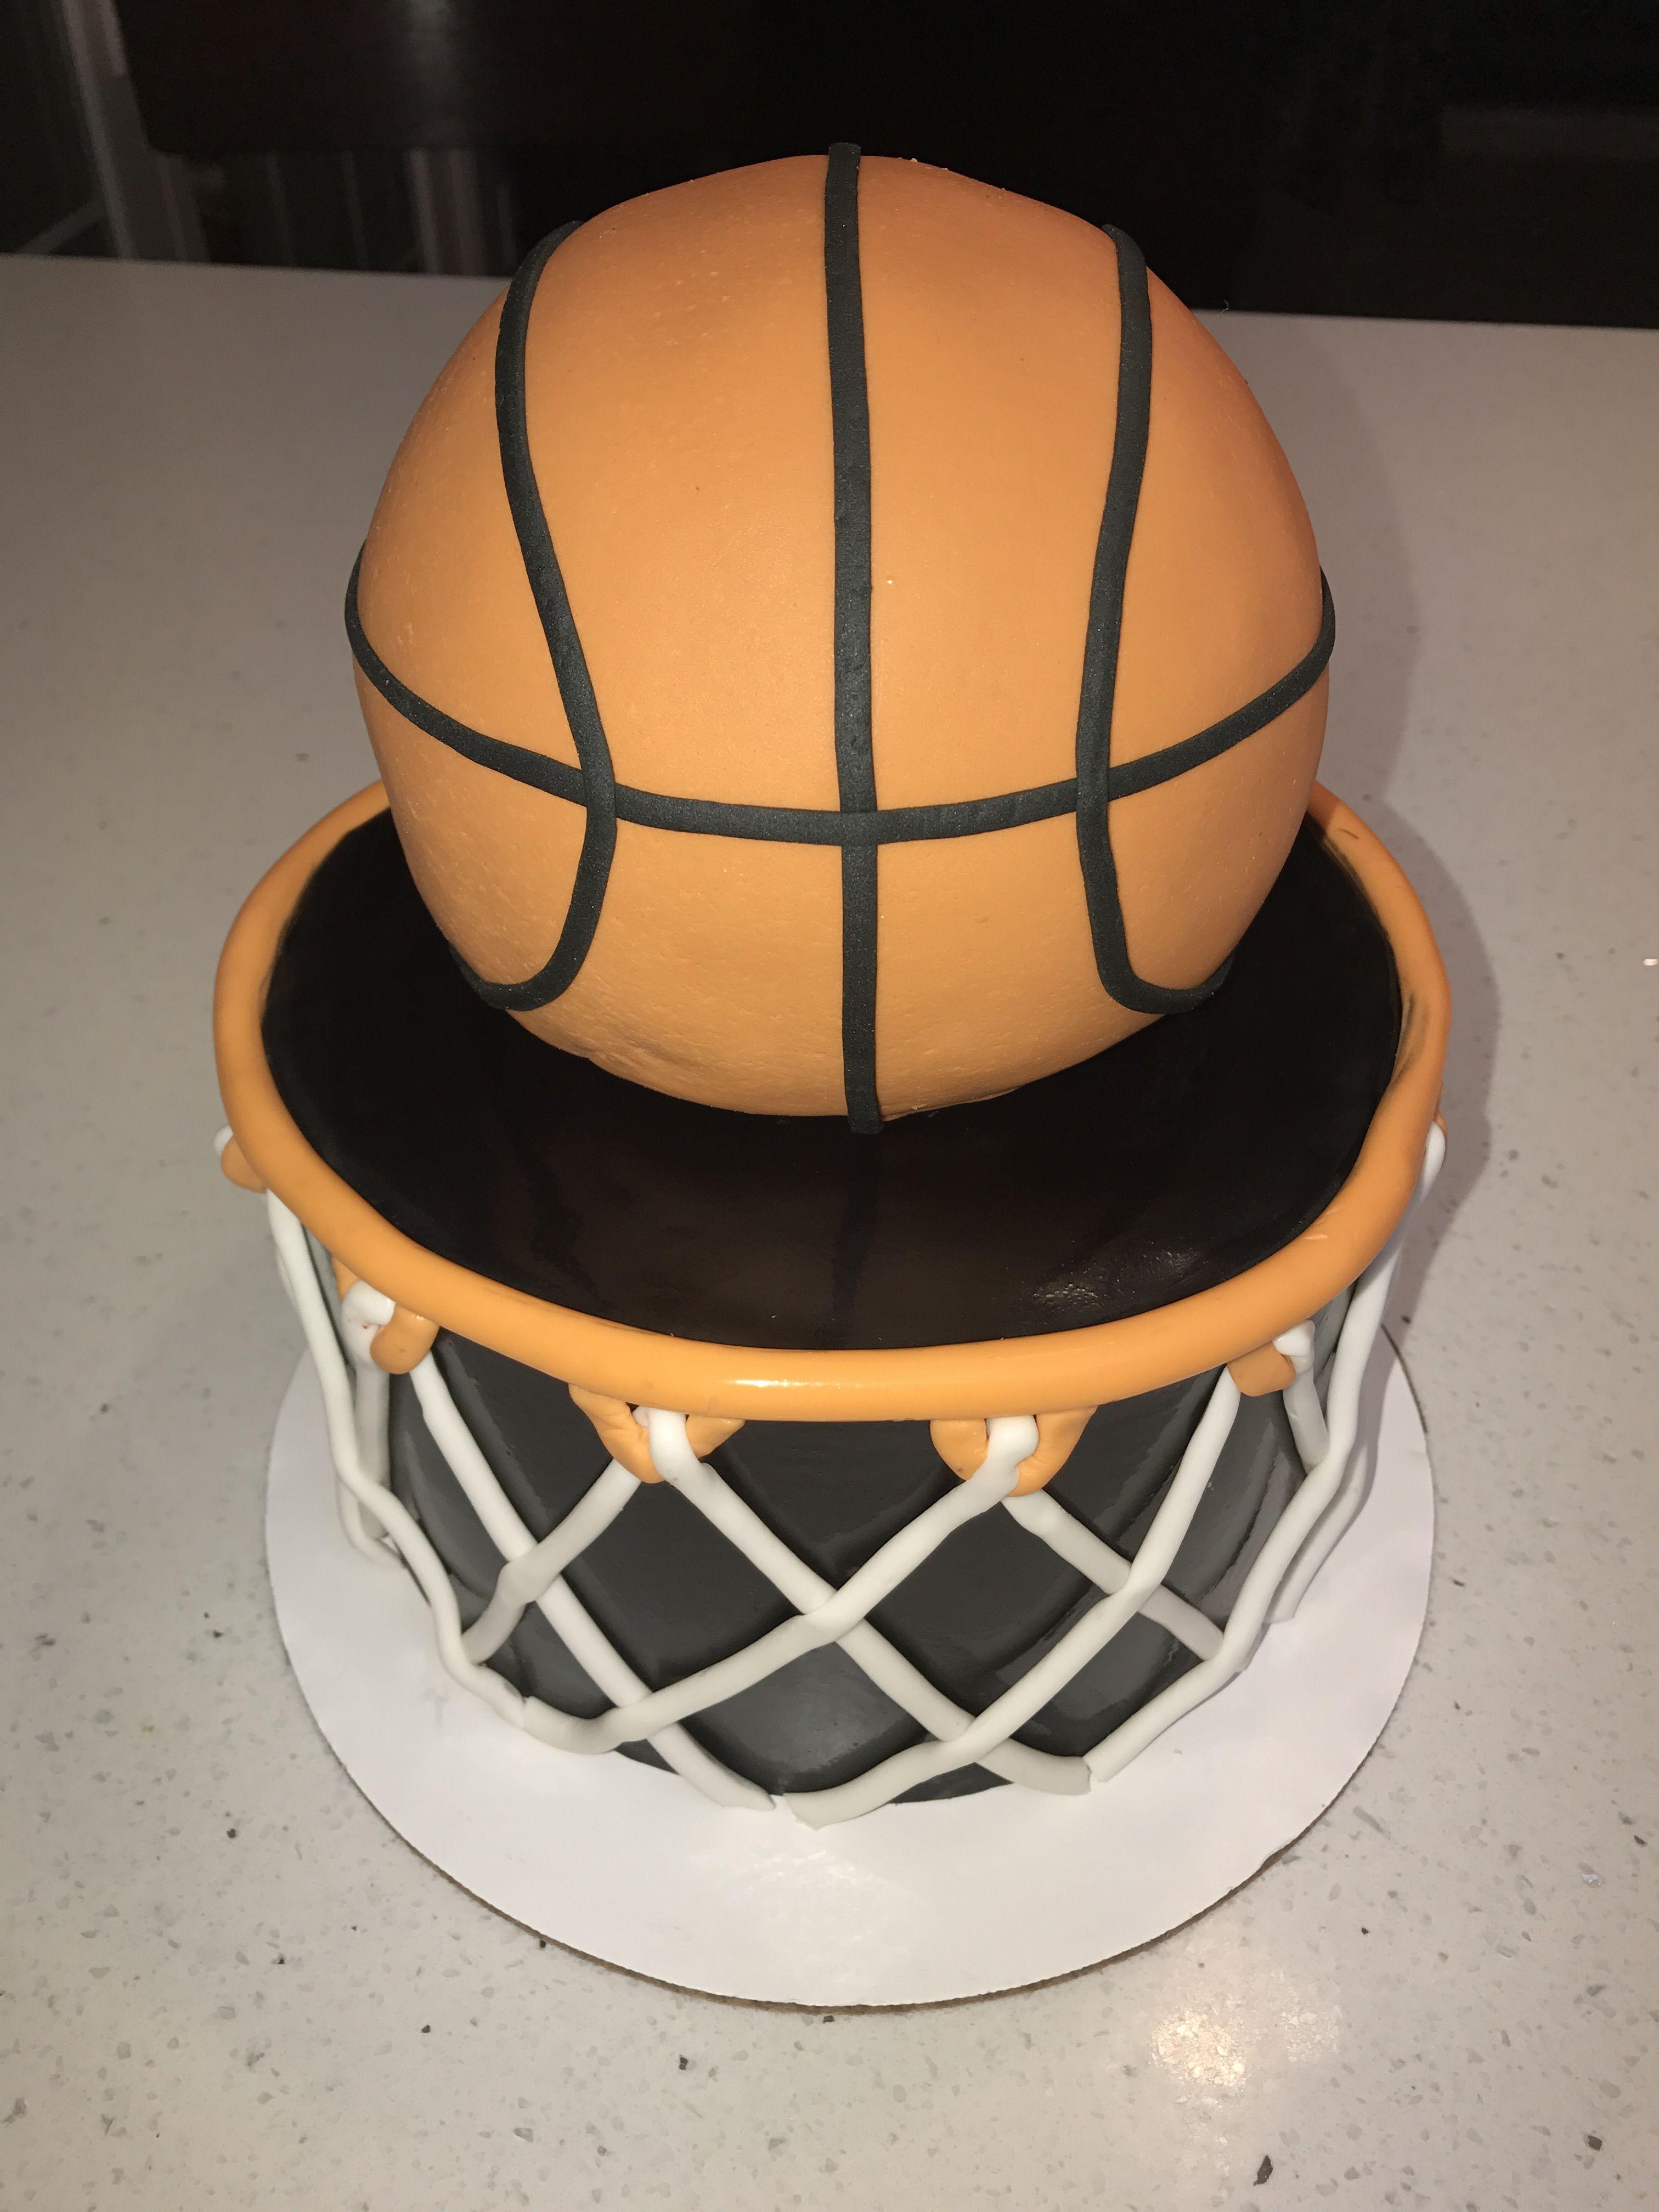 Basketball Ice Cream Cake Ice Cream Cake Cream Cake Basketball Party